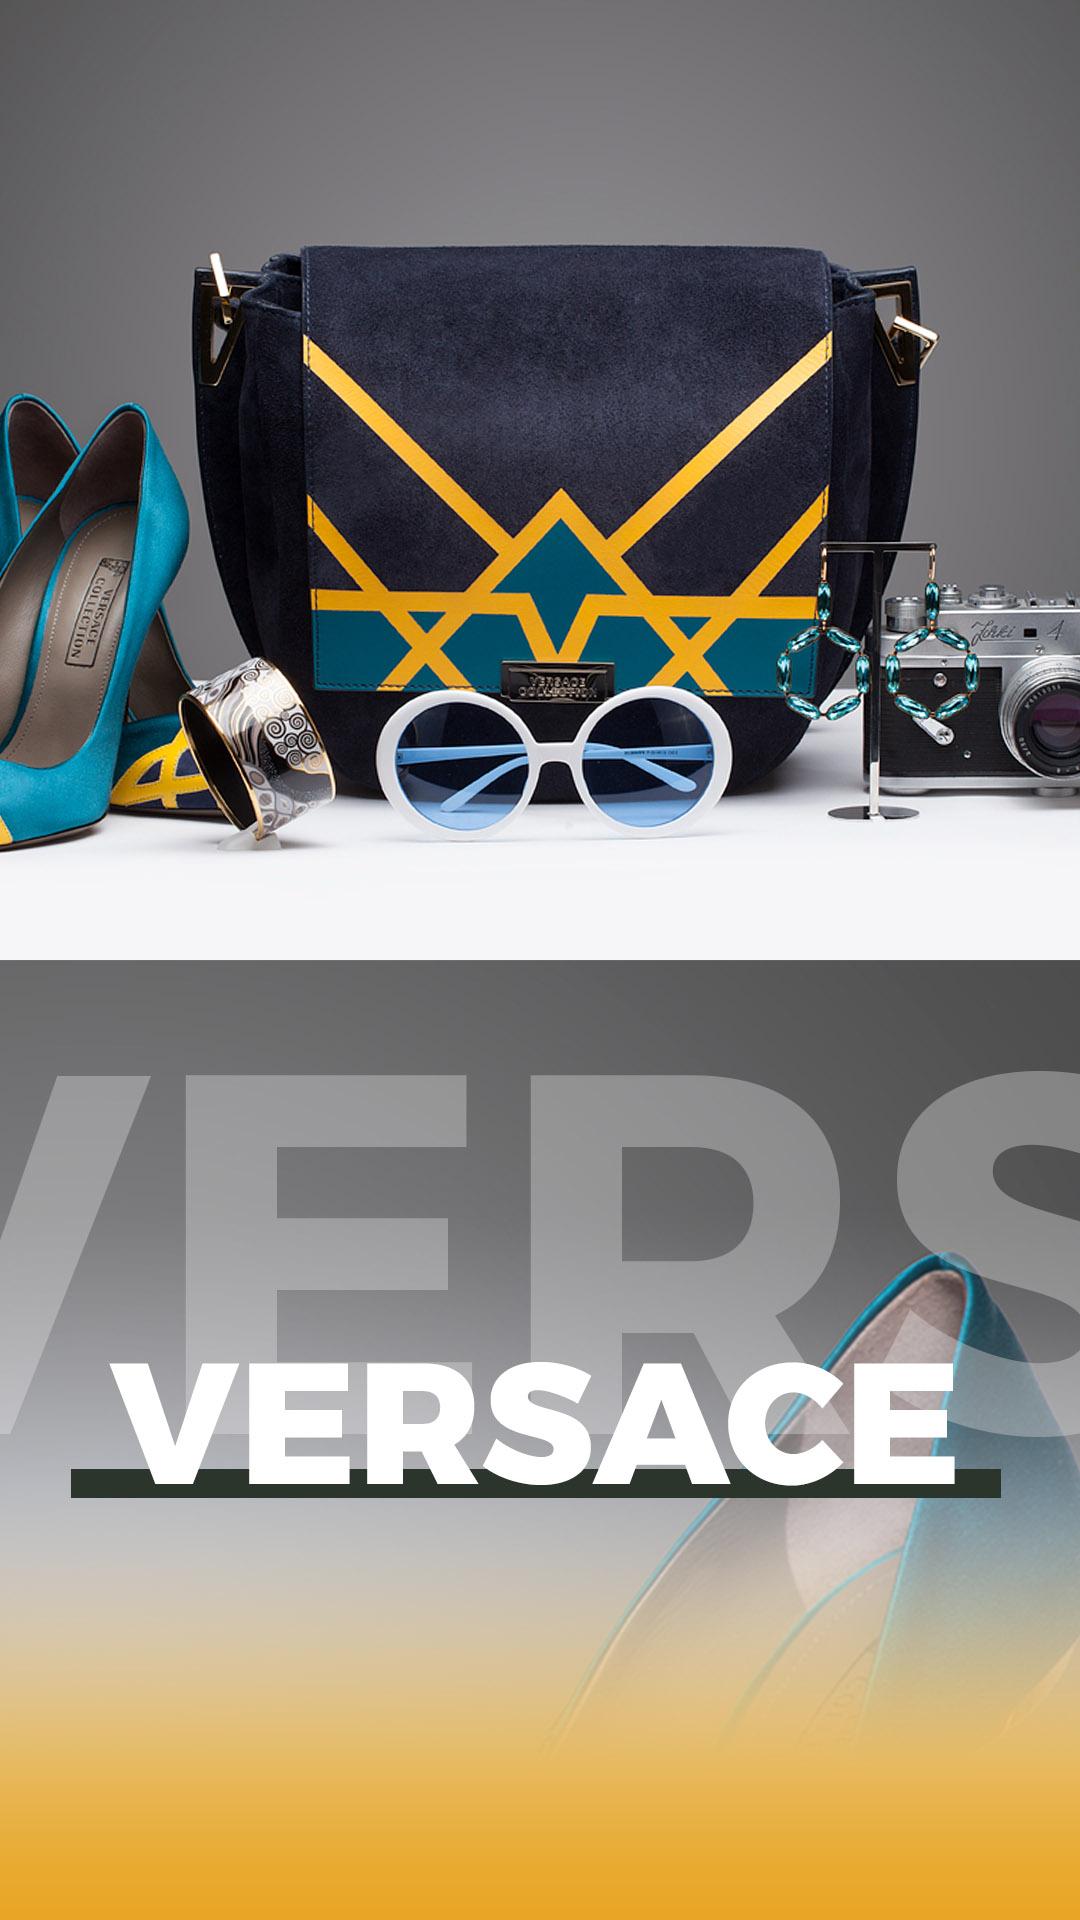 afterteam projects blog 03 versace 2018 vertical